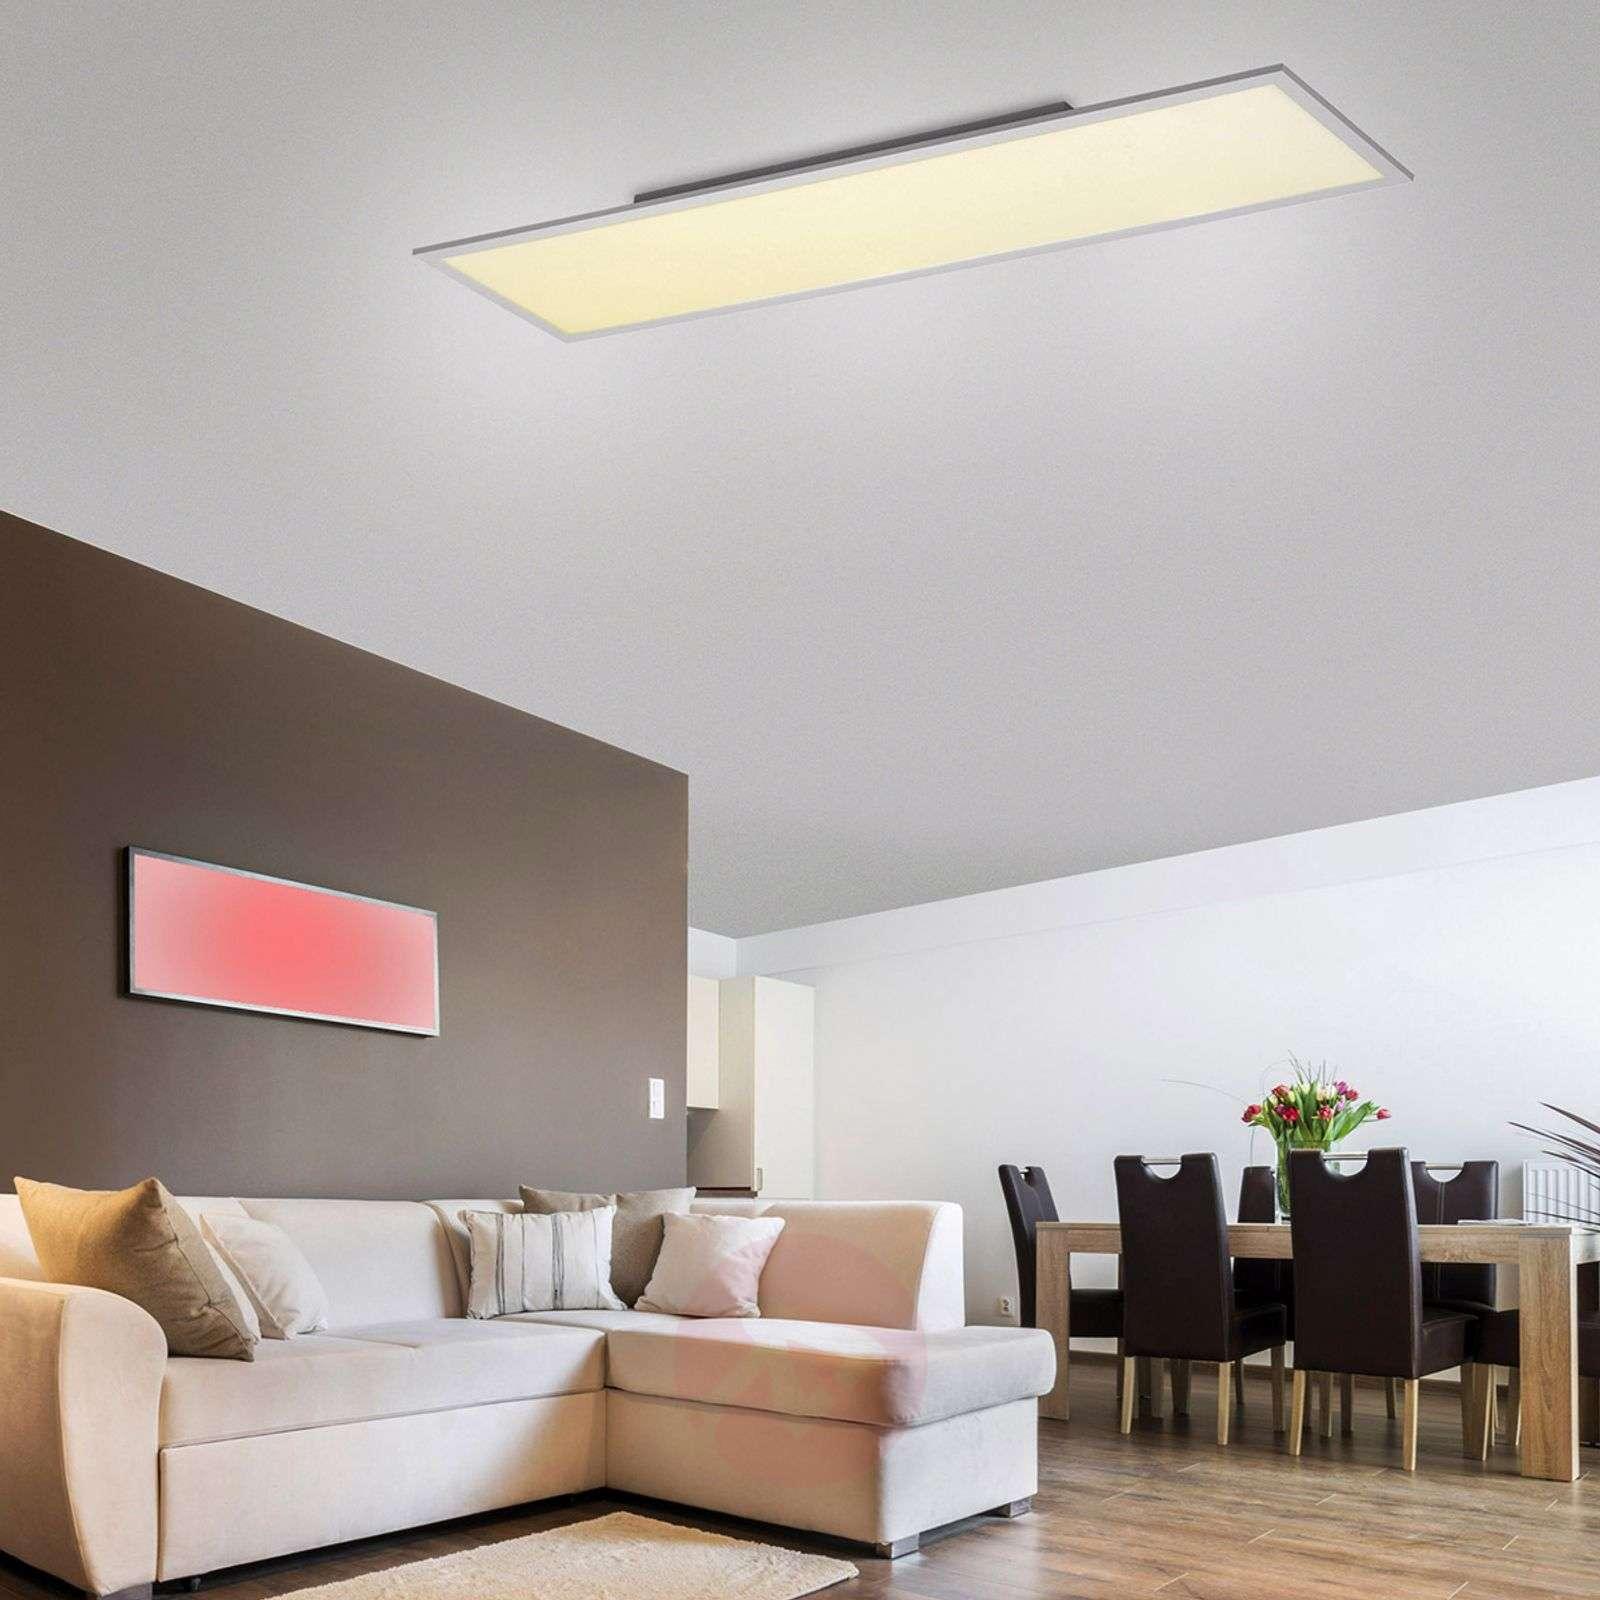 LED-kattovalaisinMilian RGBW, 120x30cm-7620061-02